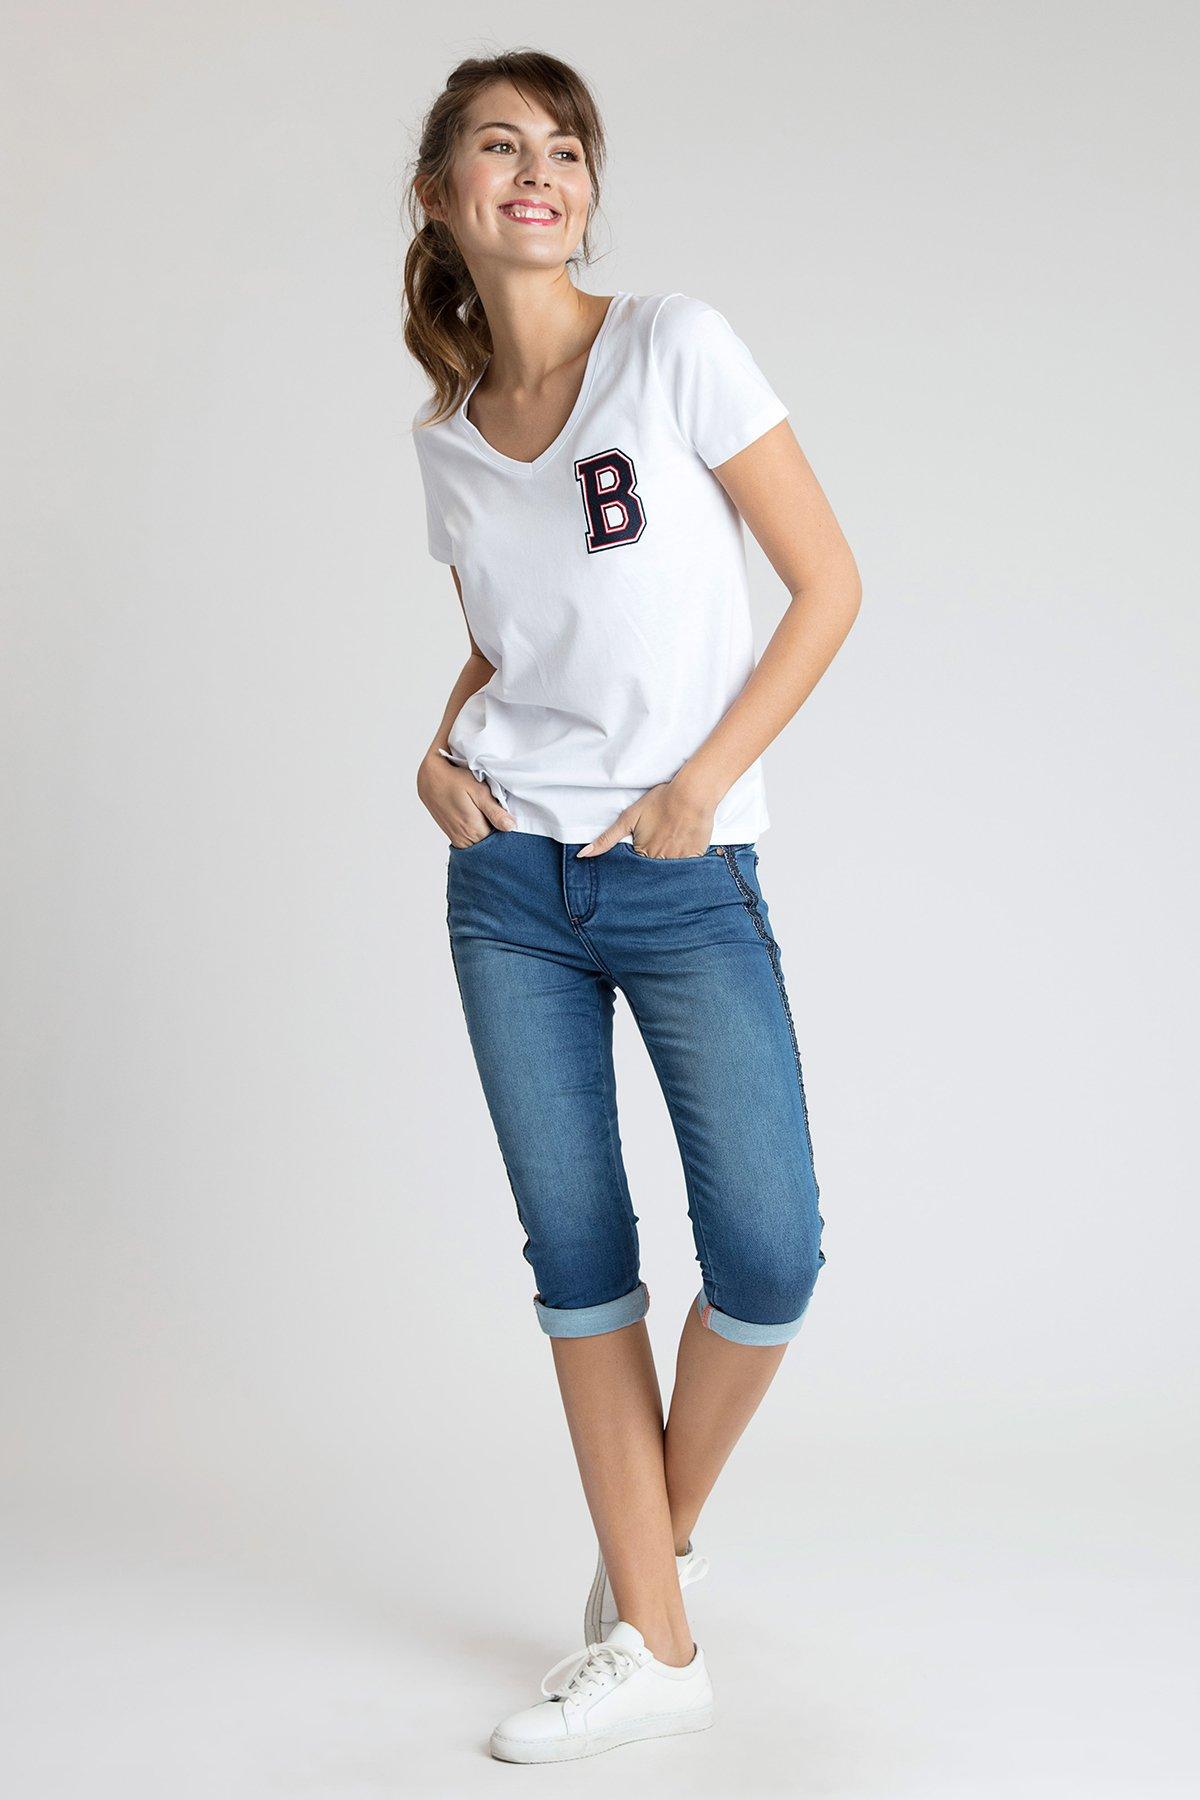 Weiß Kurzarm T-Shirt von Bon'A Parte – Shoppen Sie Weiß Kurzarm T-Shirt ab Gr. S-2XL hier